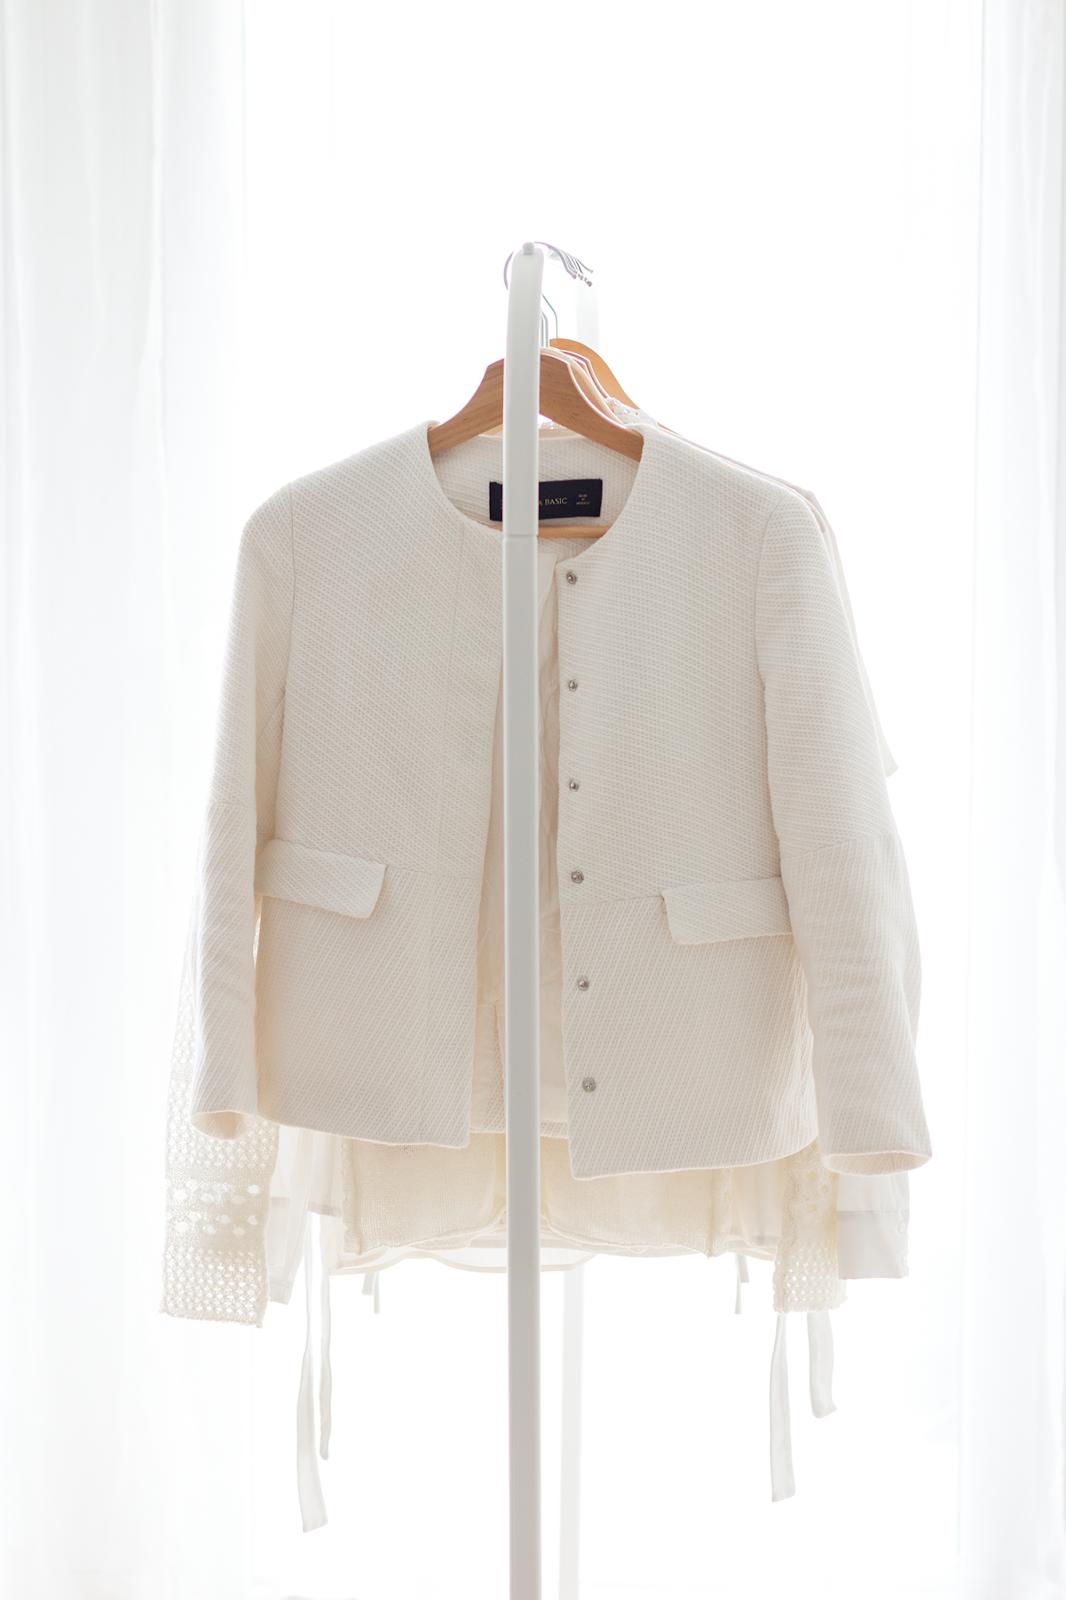 Fashion | Das Capsule Wardrobe Projekt | www.sparklyindpiration.com